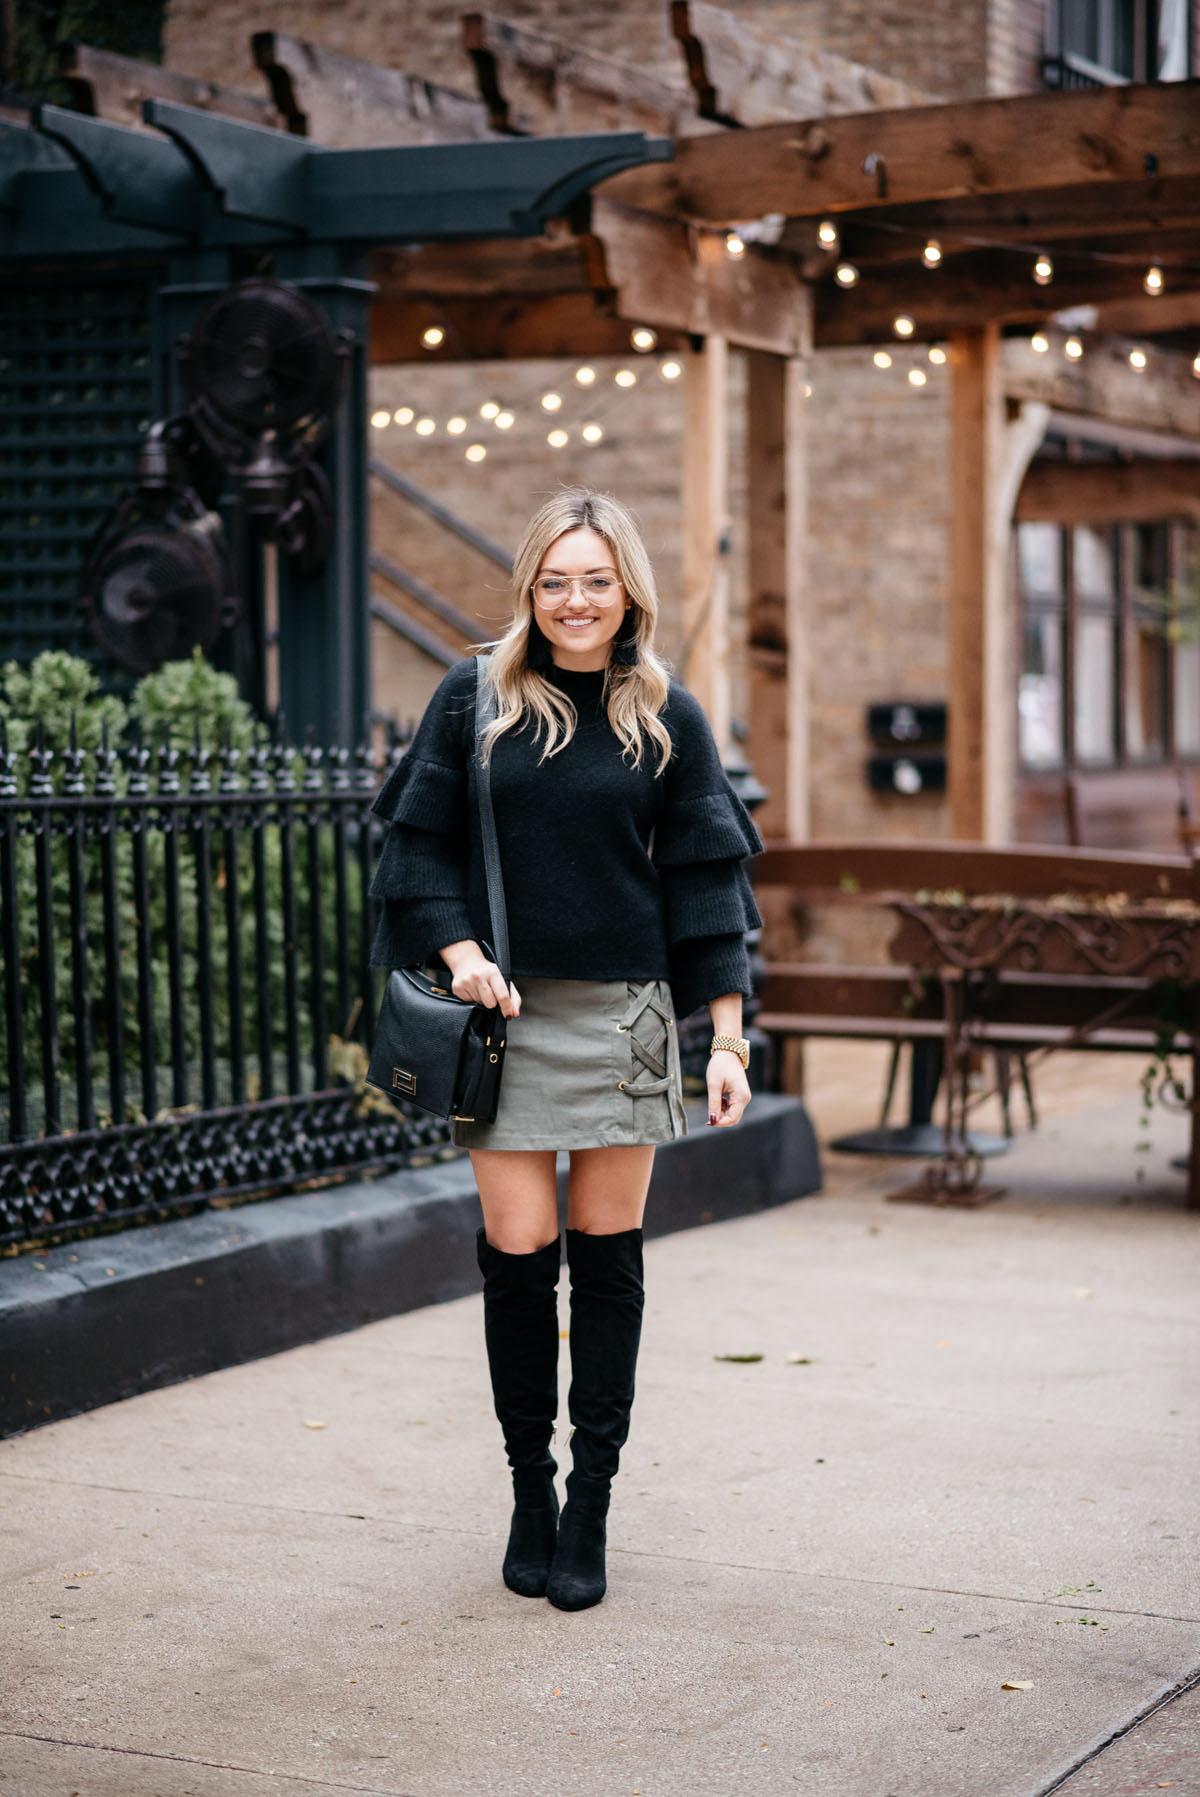 5368cc0b742 Fashion and lifestyle blogger Jessica Sturdy wearing an Endless Rose black  ruffle sleeve sweater